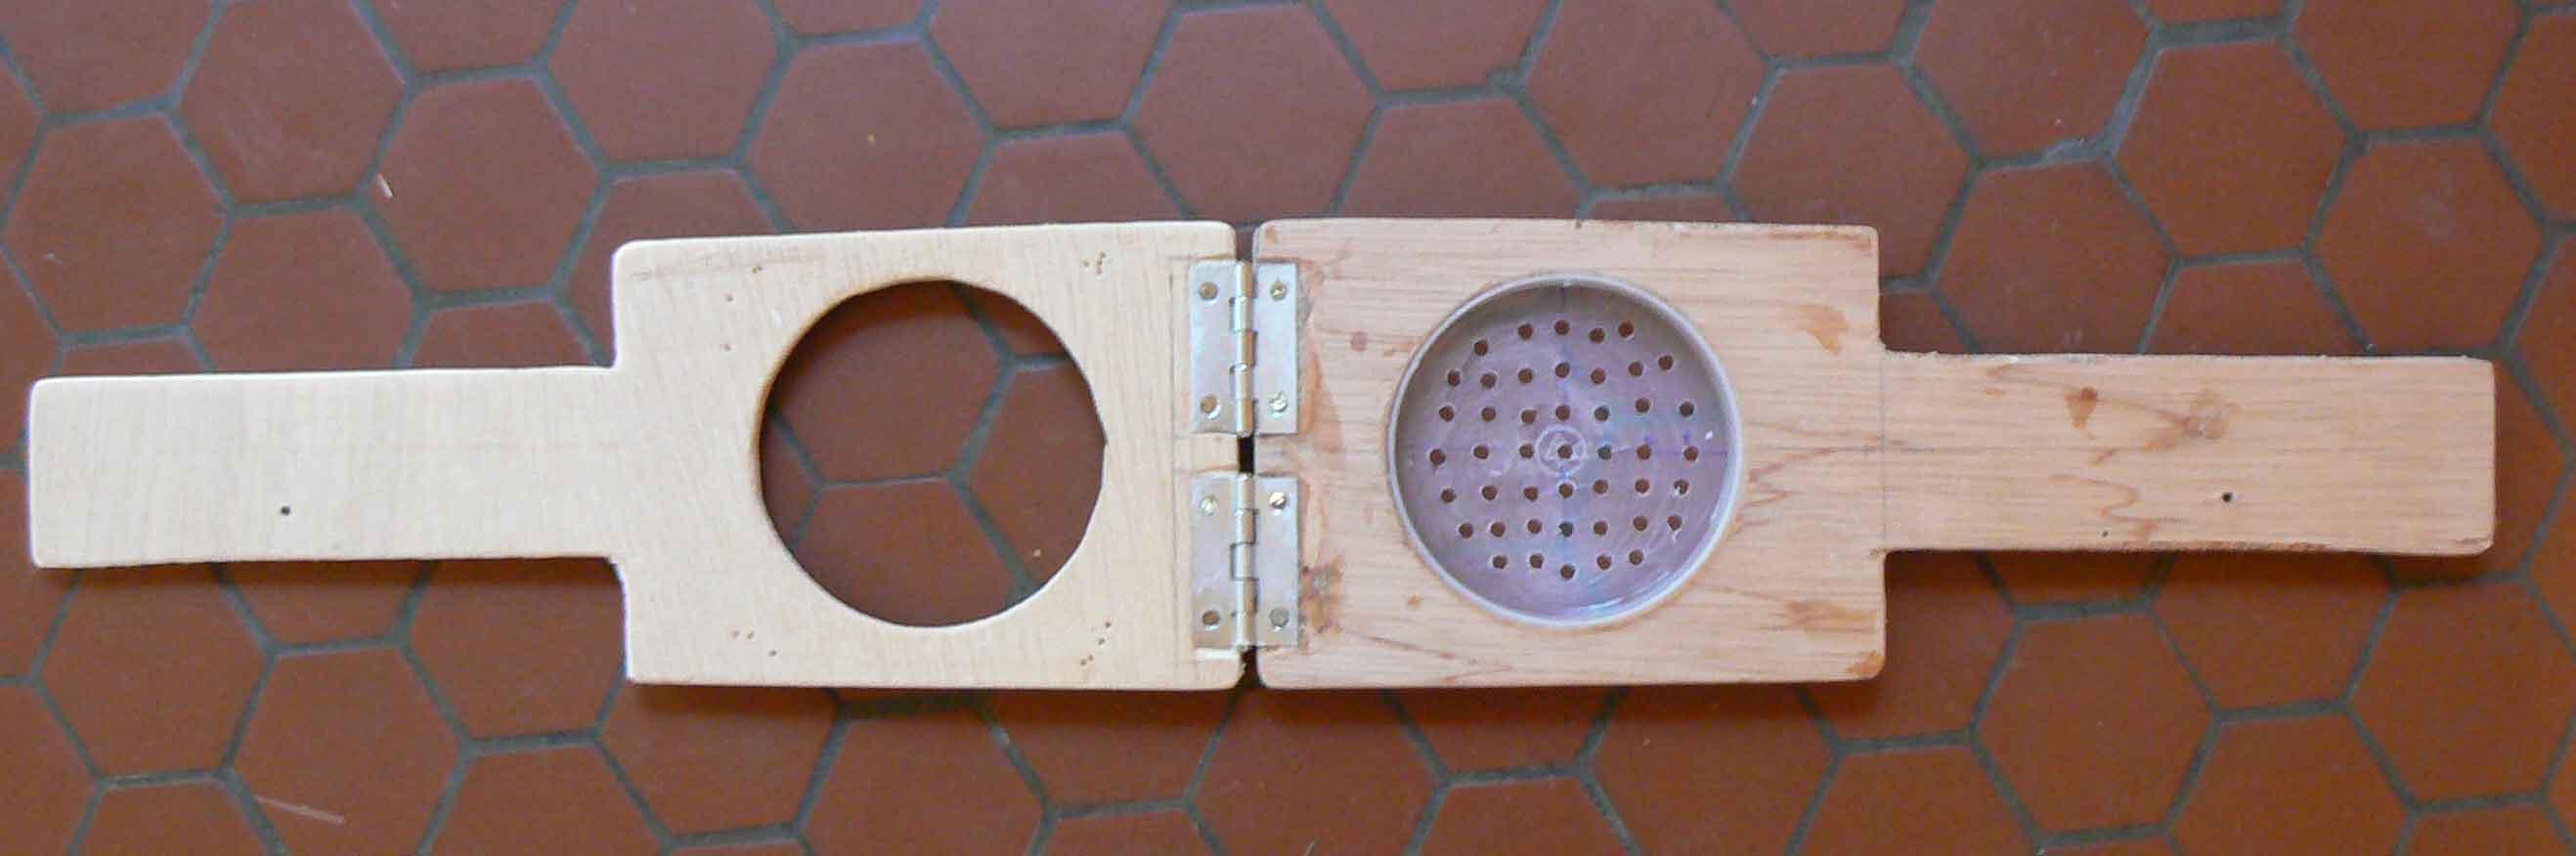 Thermoformage maison par ---migou31--- JeJrEx